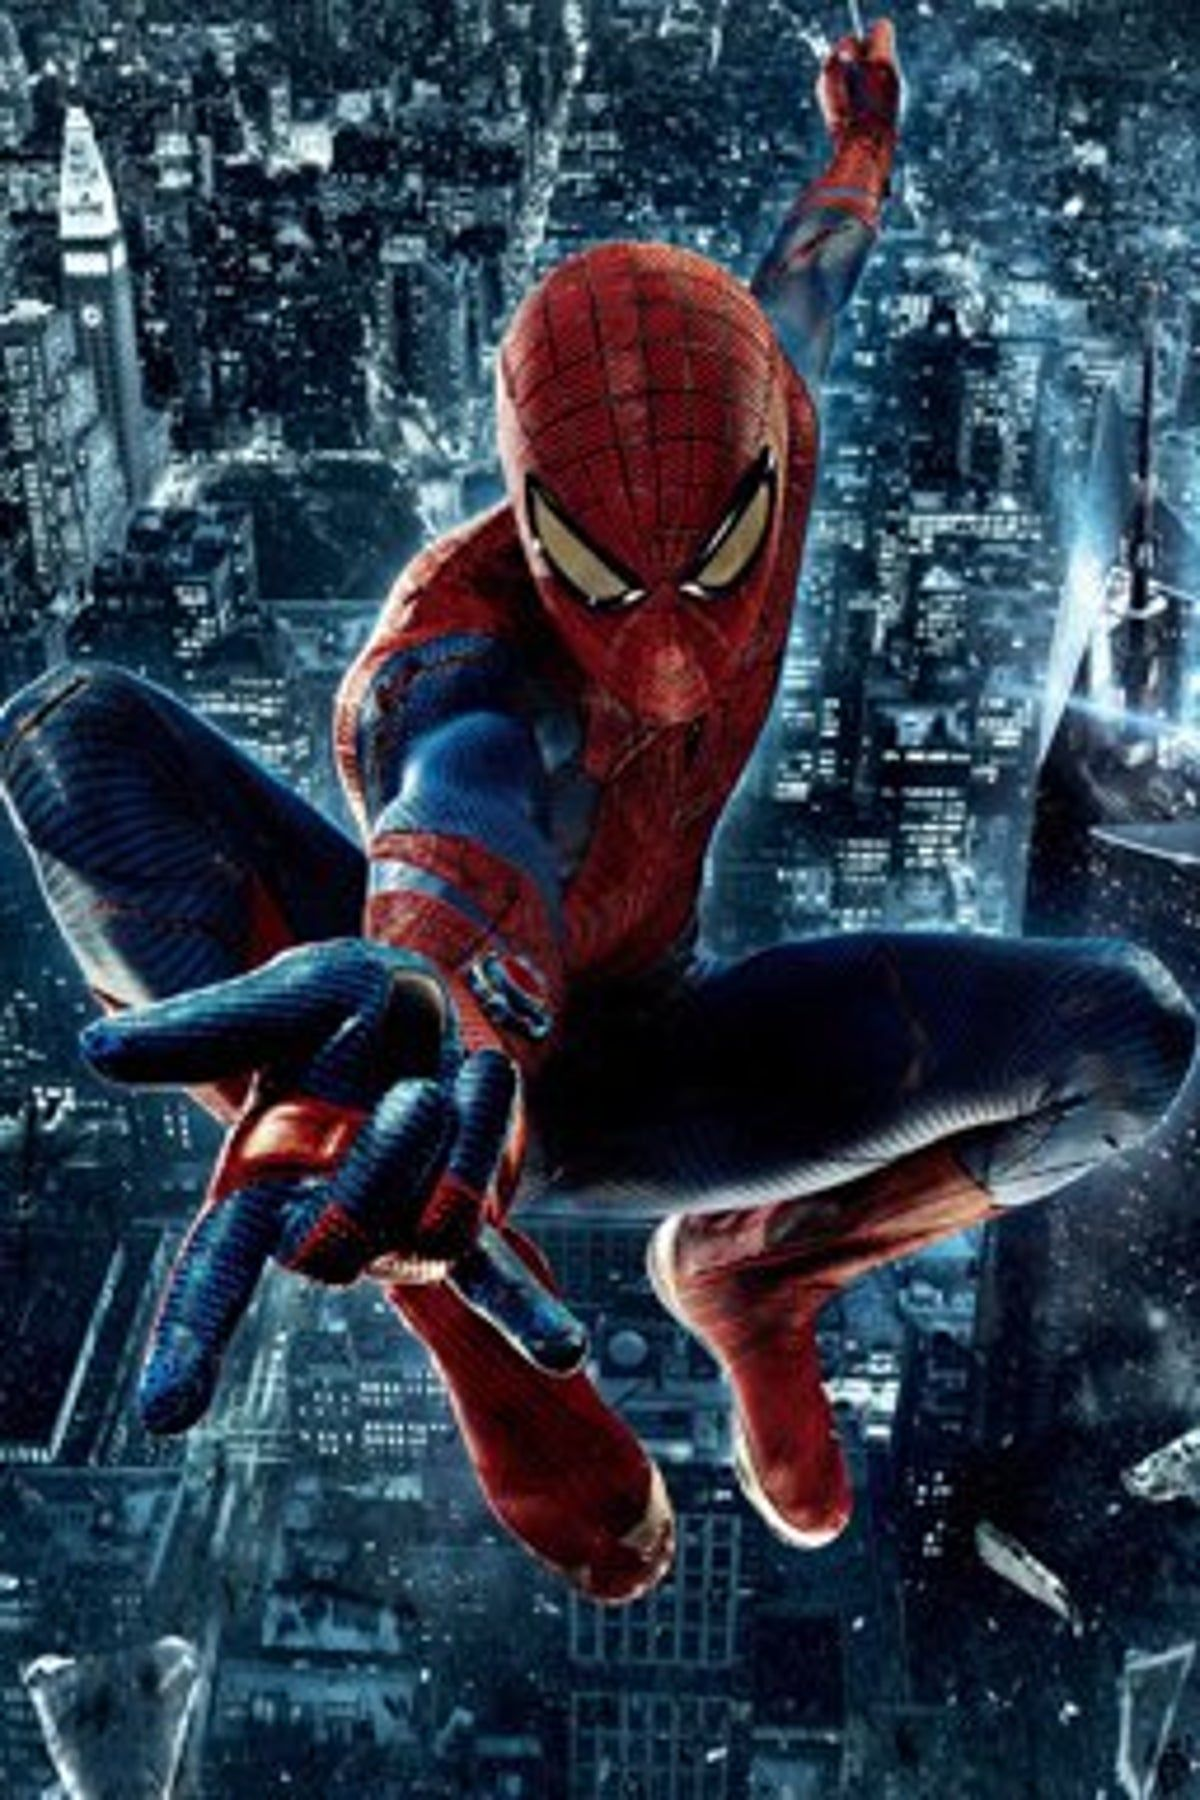 spiderman Andrew Garfield movie poster